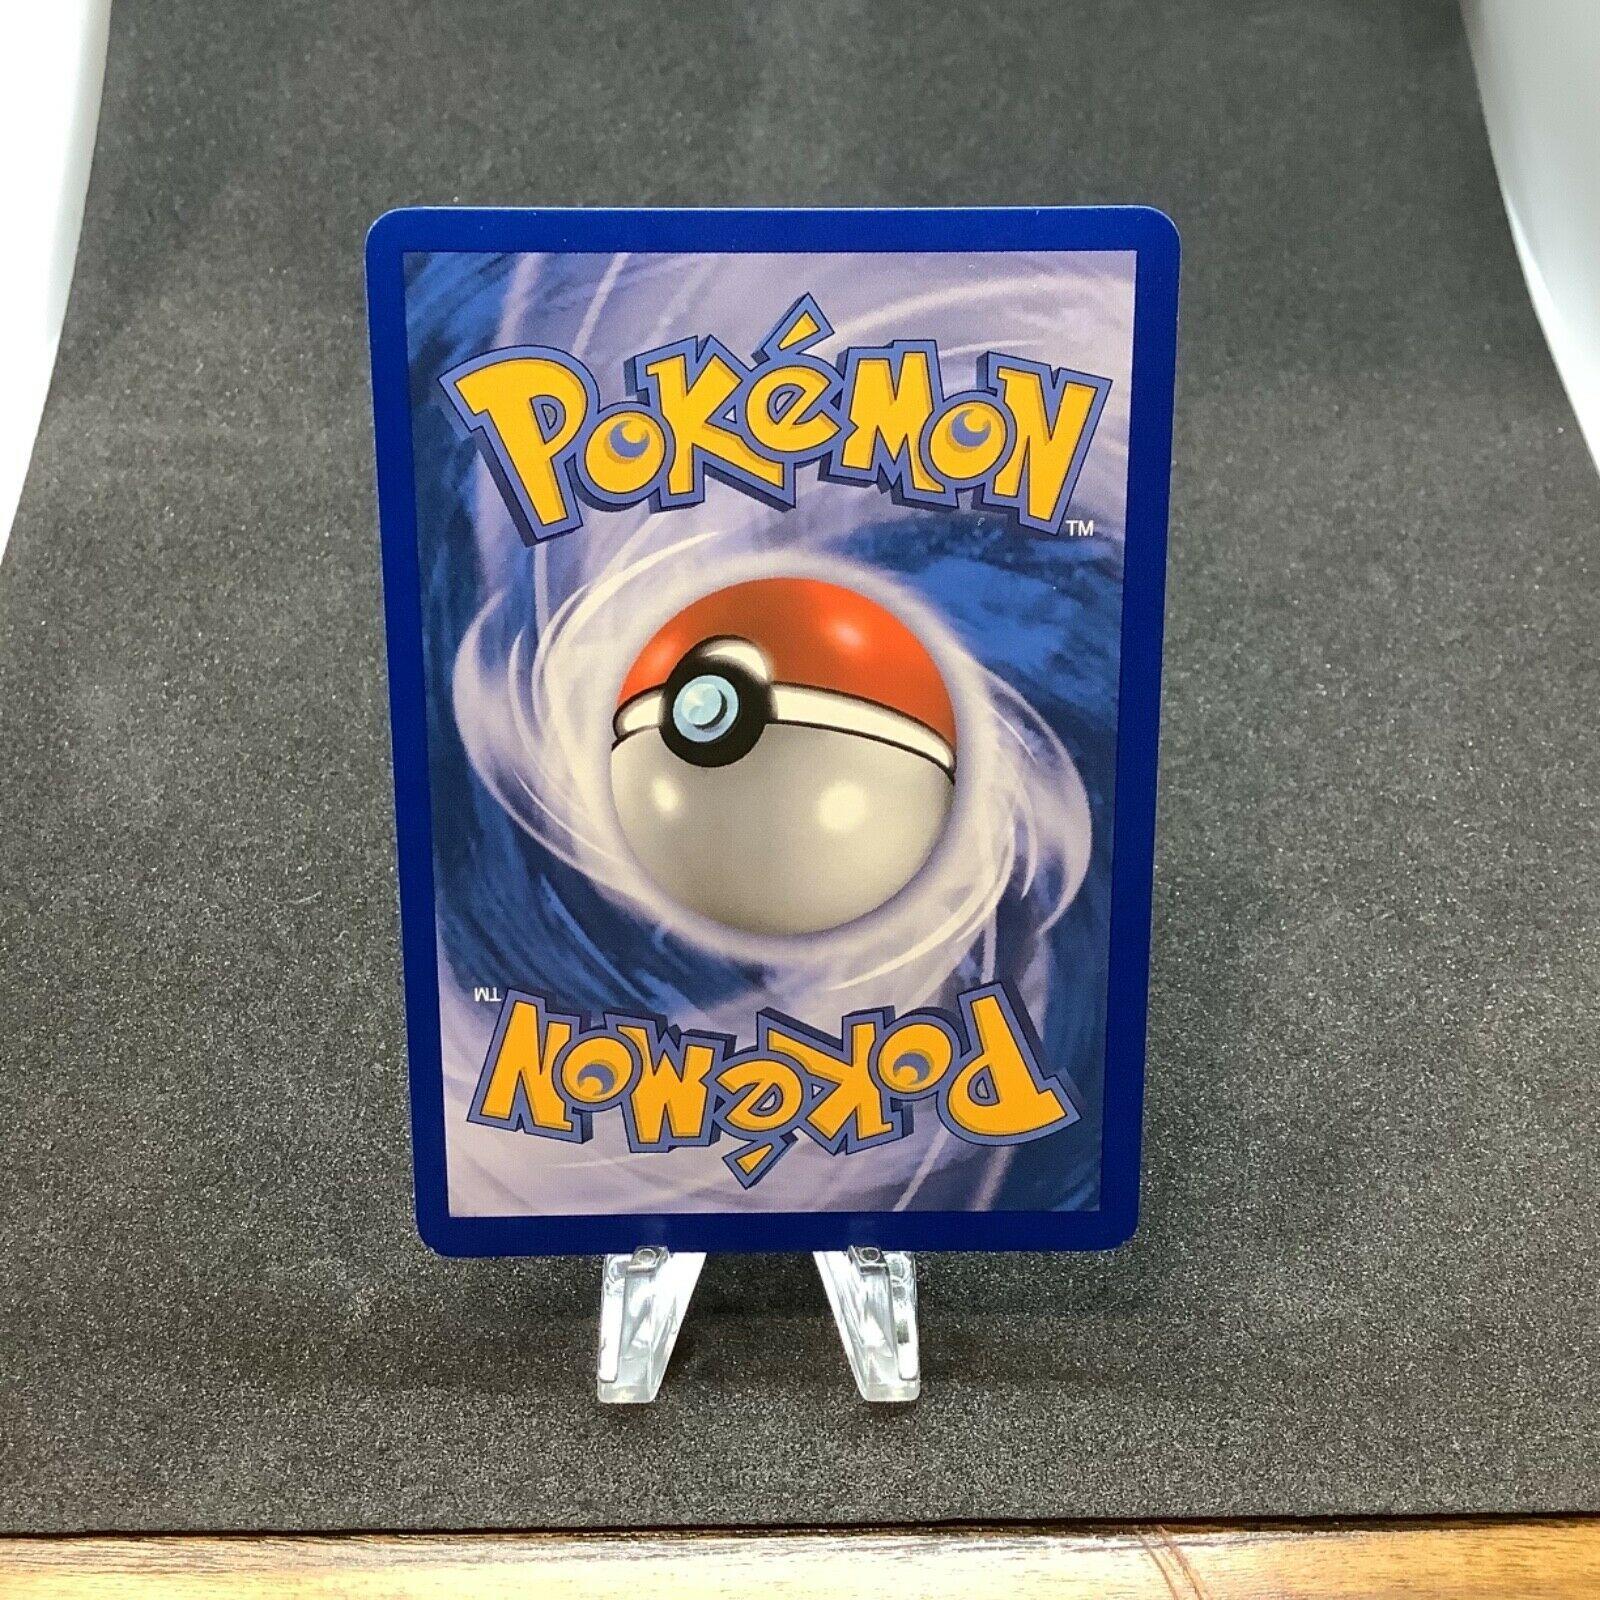 Absol Prime HGSS Triumphant 91/102 Holo Rare Pokemon Card NM - Image 7